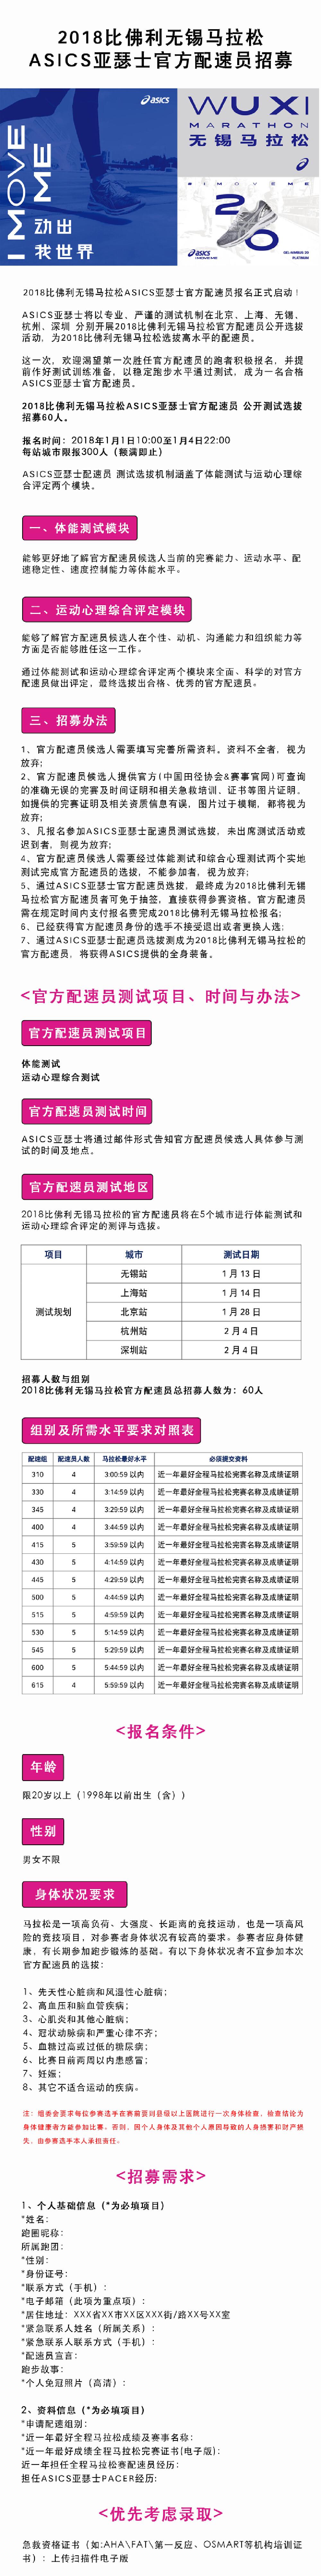 V3兔子招募手机版(含主KV).jpg